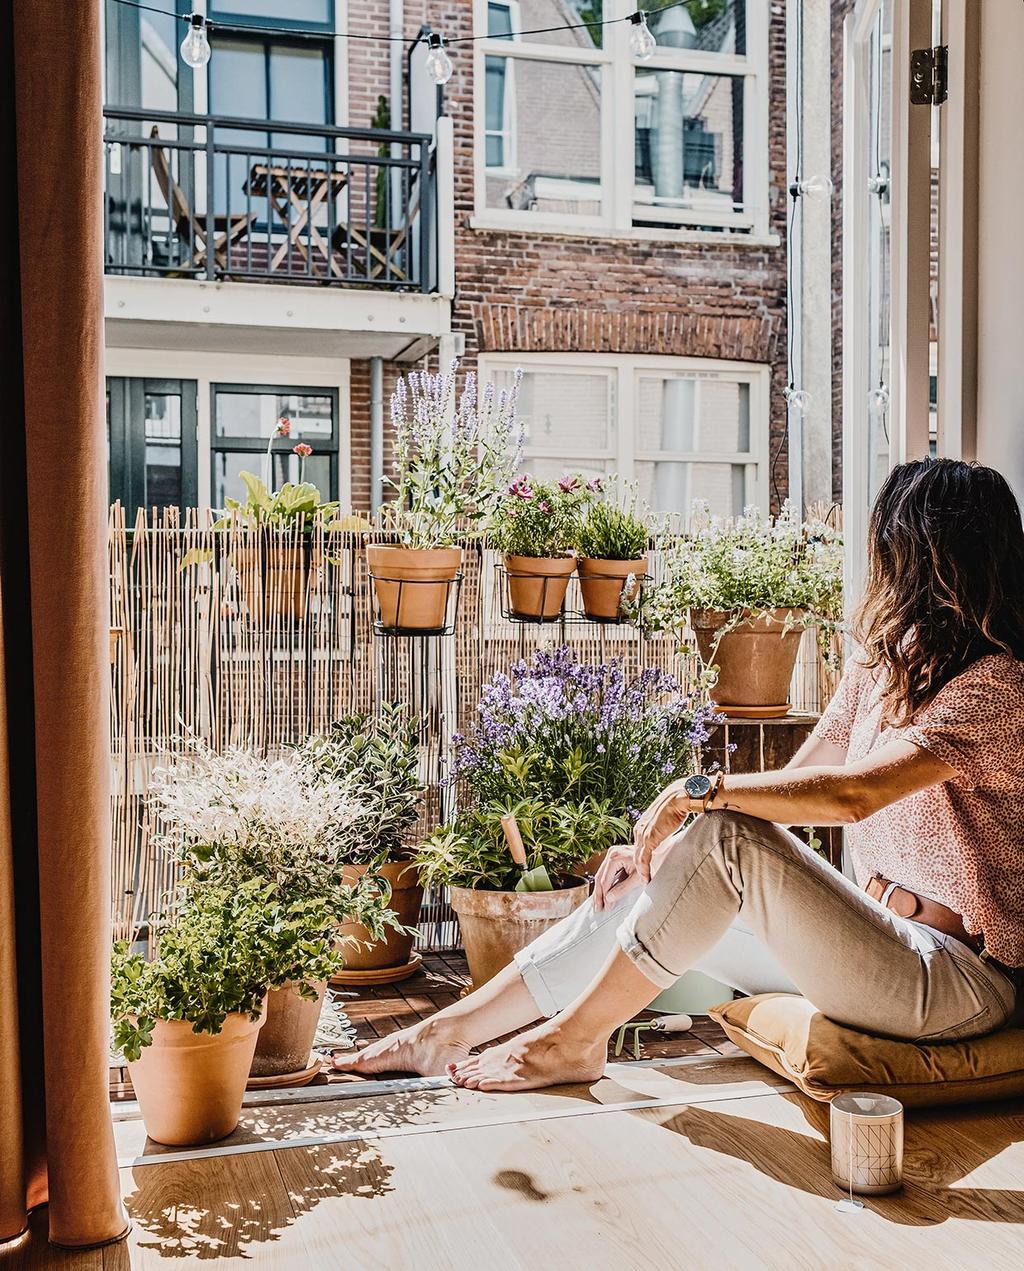 vtwonen 02-2021 | Friederike zittend op het balkon